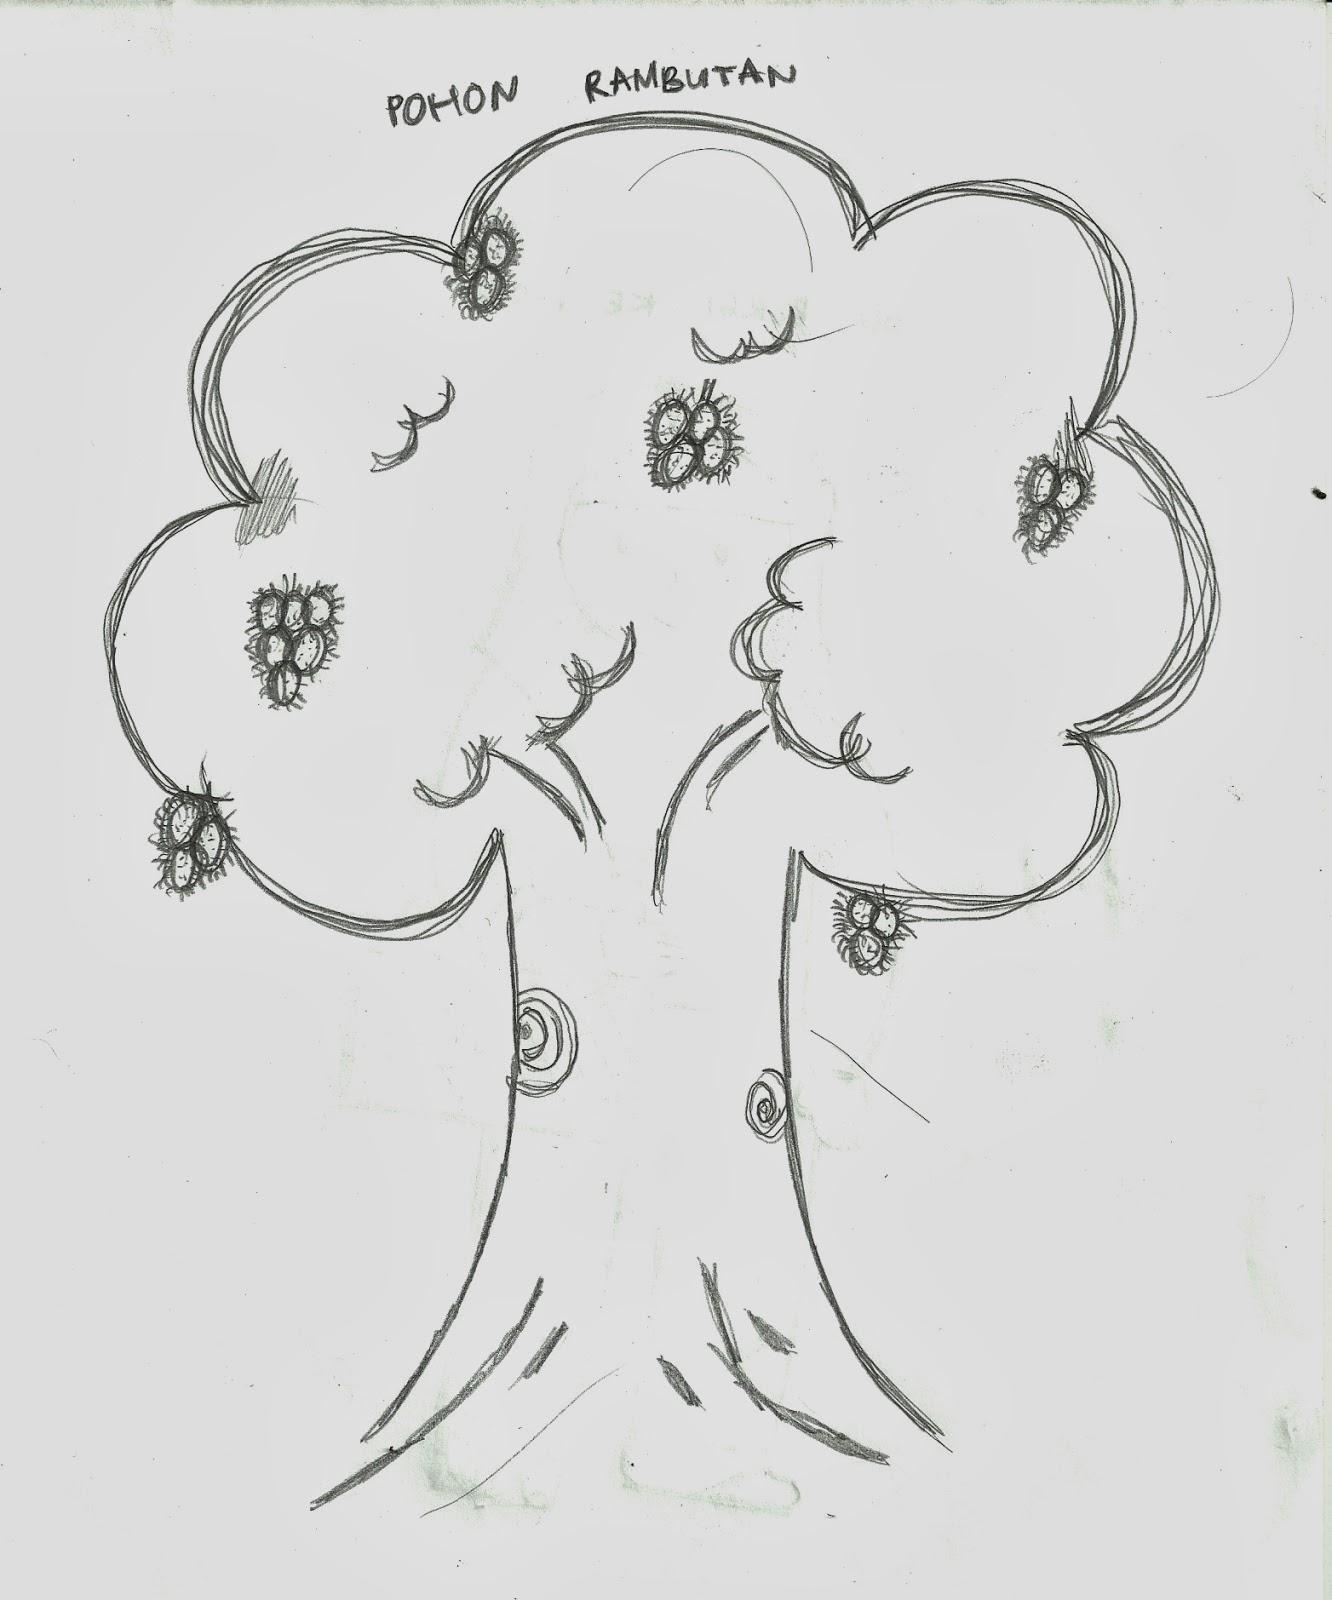 gambar-pohon-psikotes